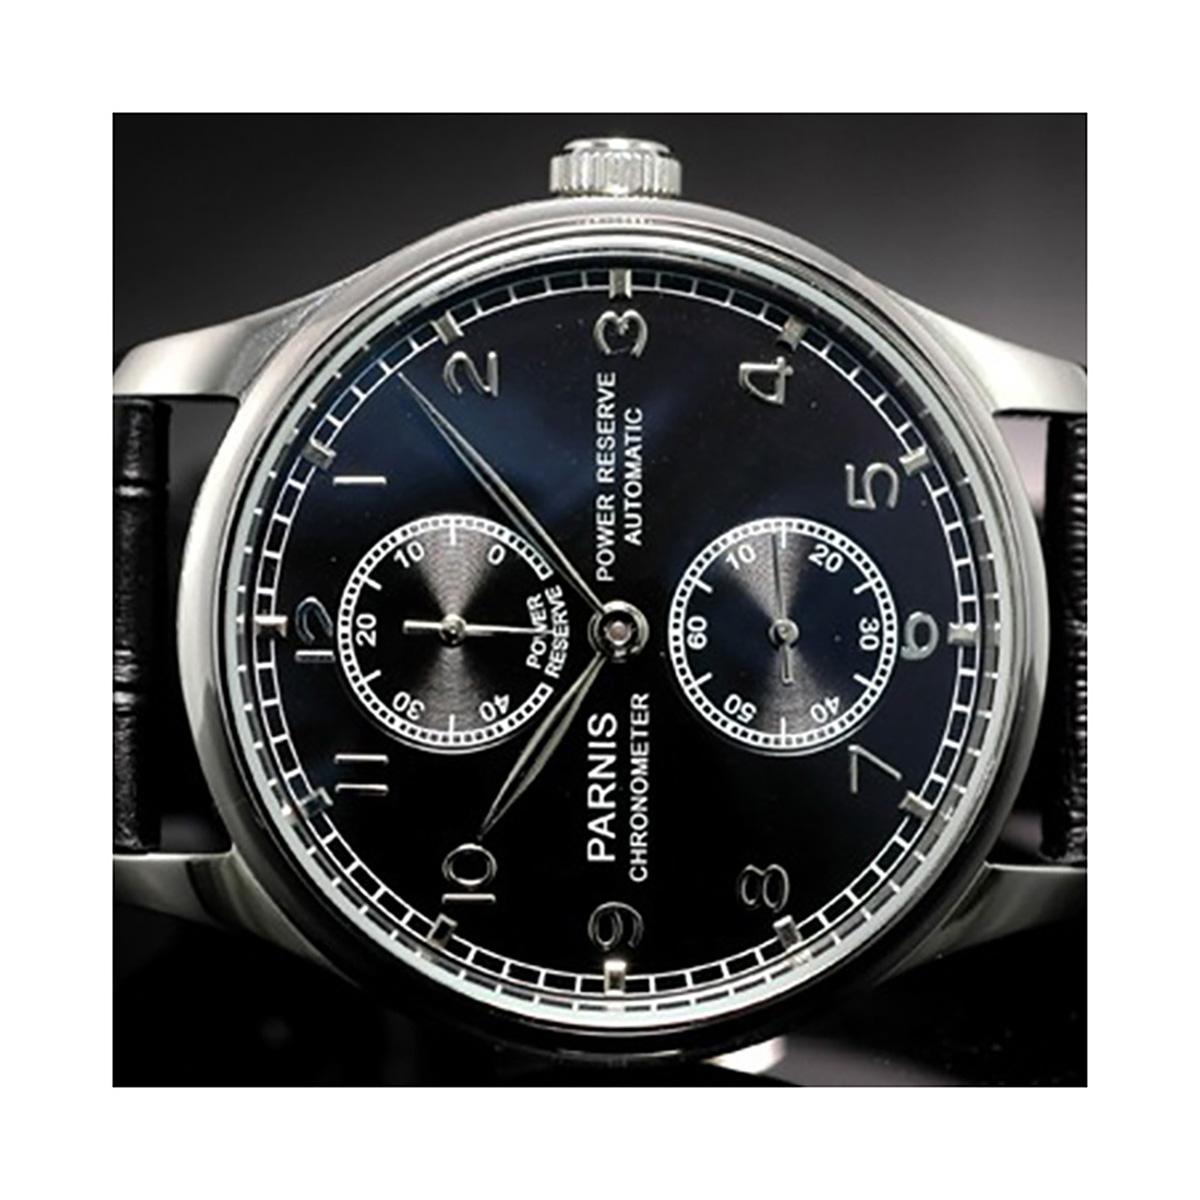 PARNIS パーニス 自動巻き 腕時計 メンズ [PN-039S4ALP] 並行輸入品 当店保証24ヵ月